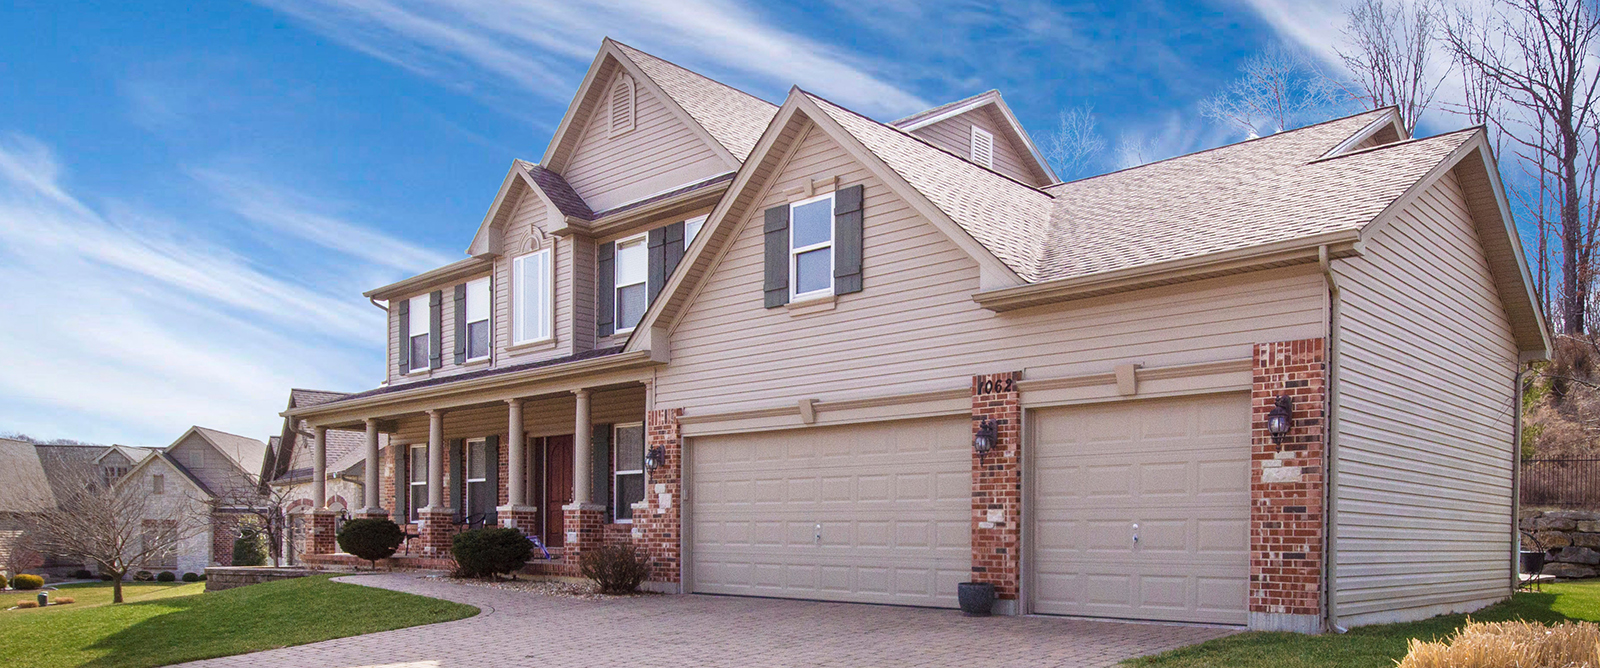 Q&A on T.R. McKenzie's Home Buyer Program